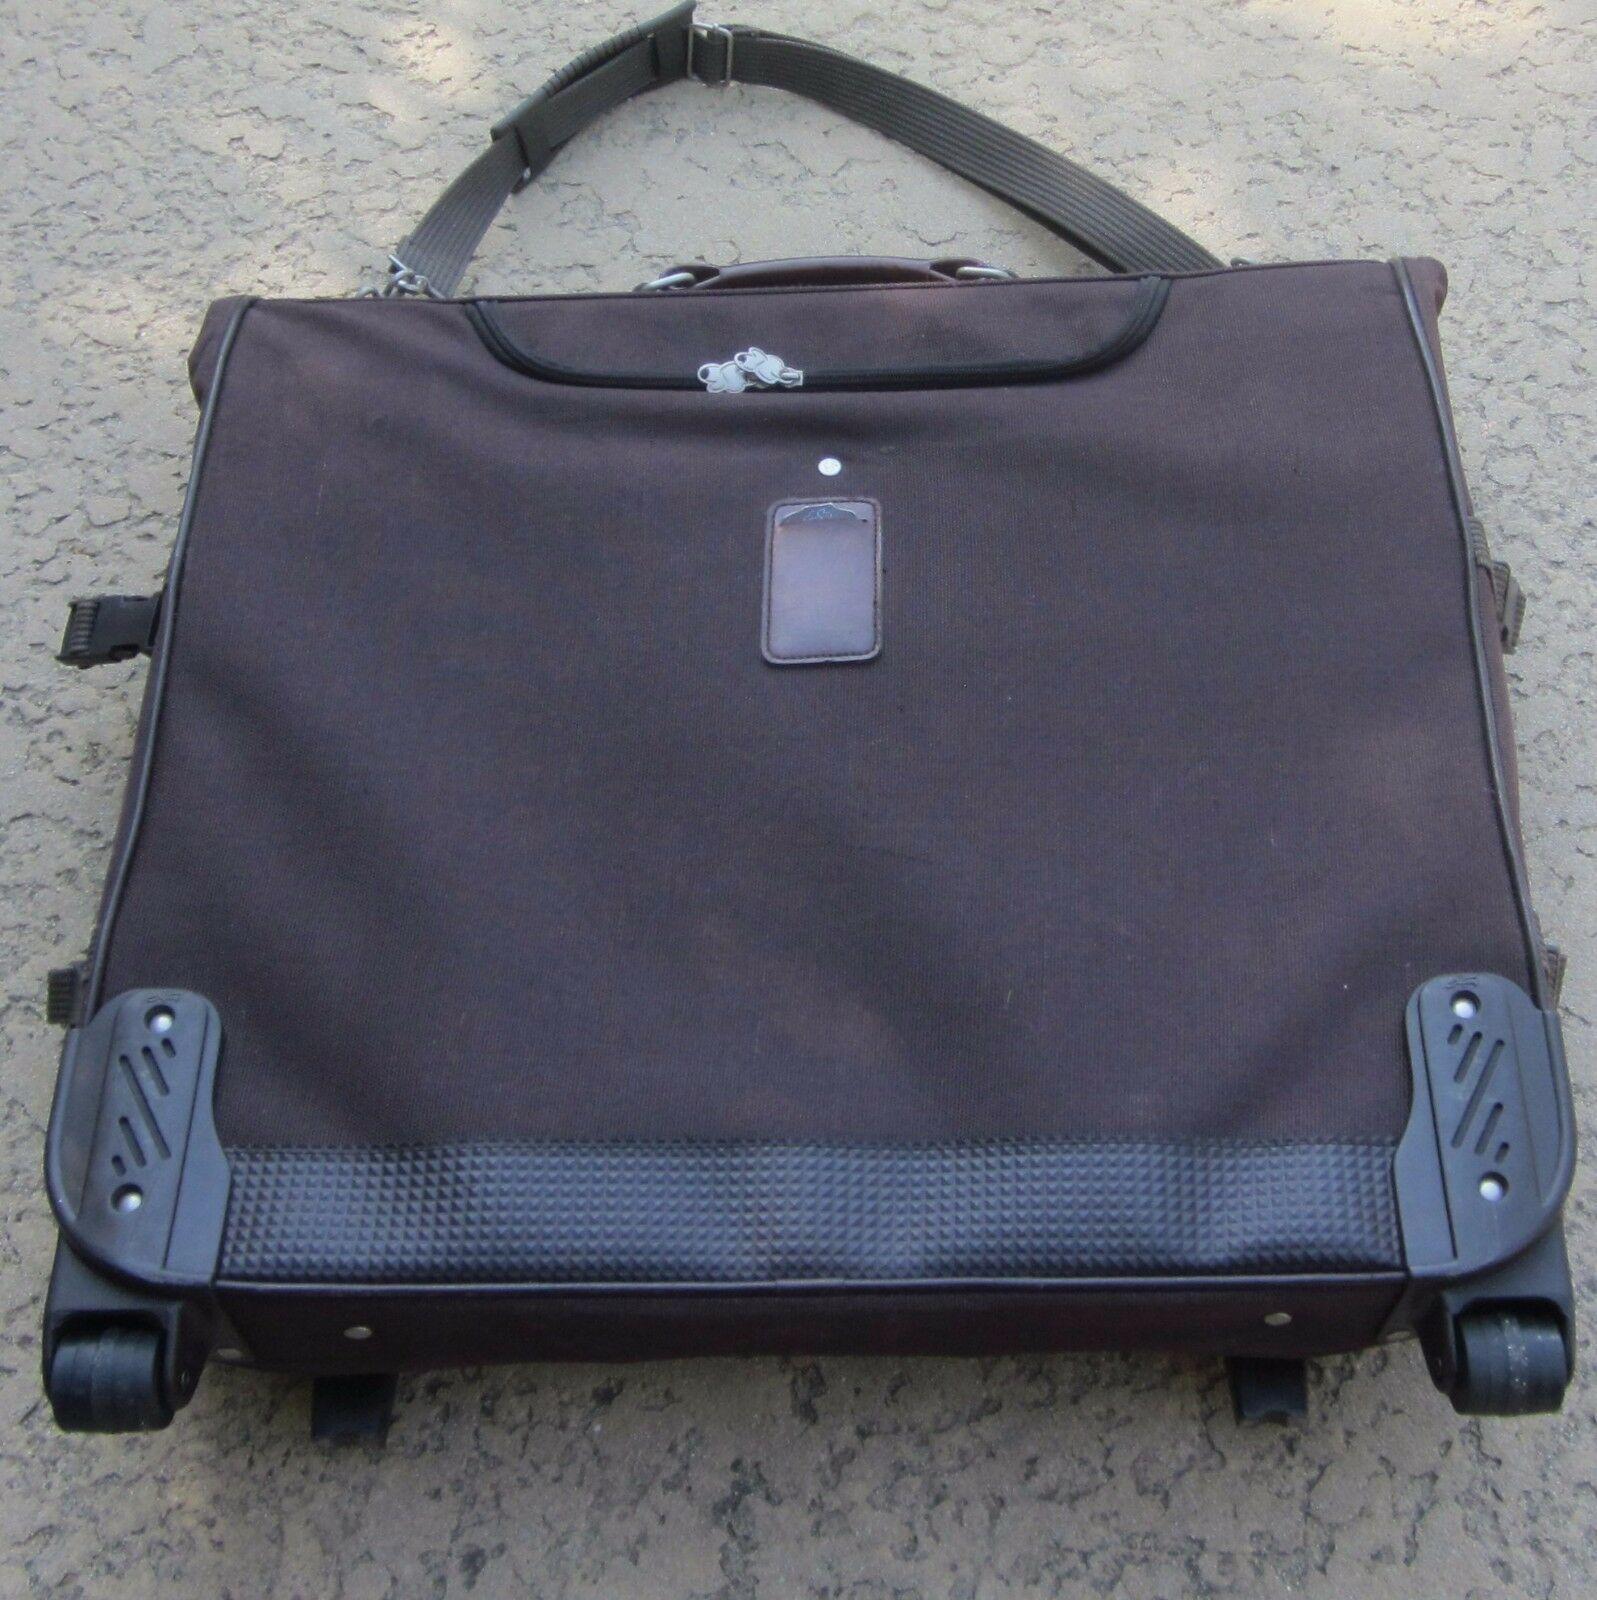 Skyway Large Brown Hanging Baggage Luggage Rolling Garment ...  Skyway Wheeled Garment Bags